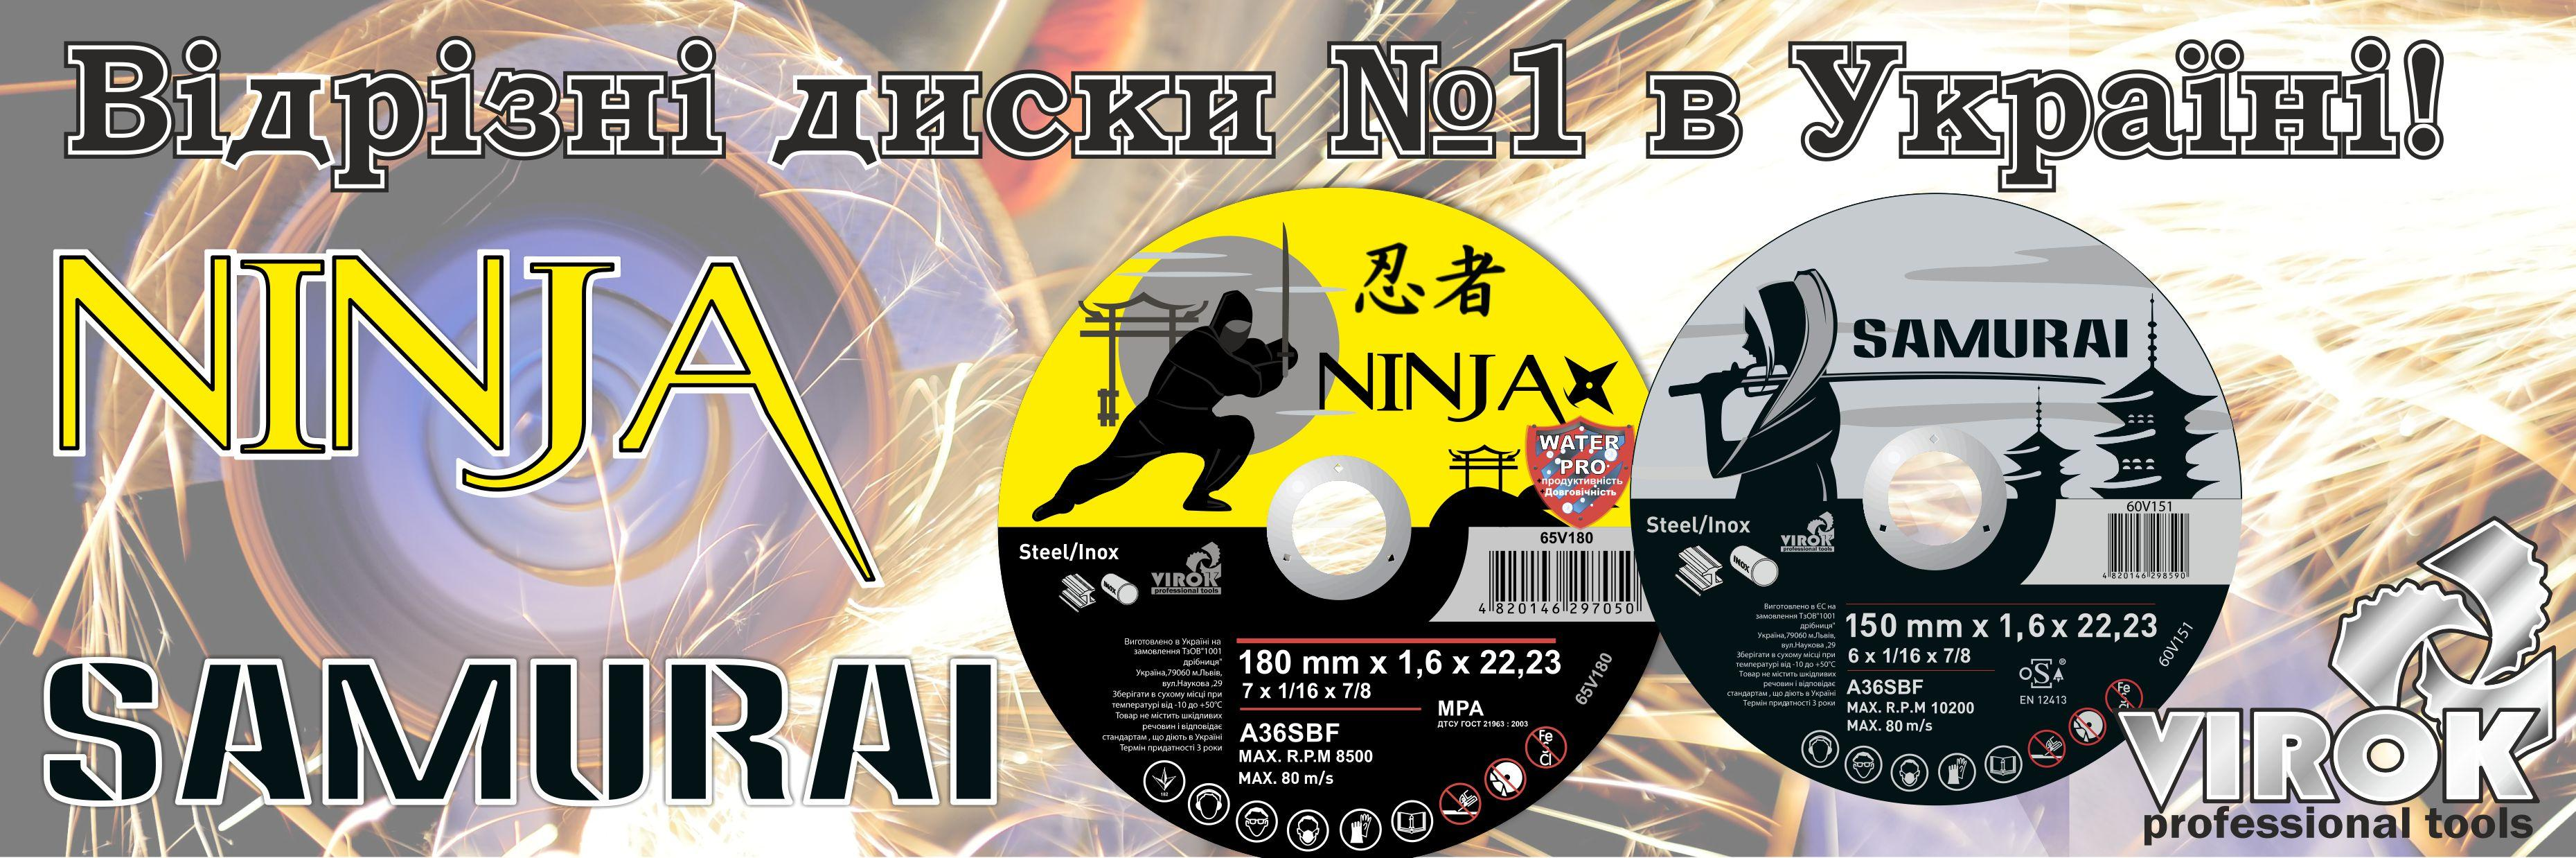 ninja samuray